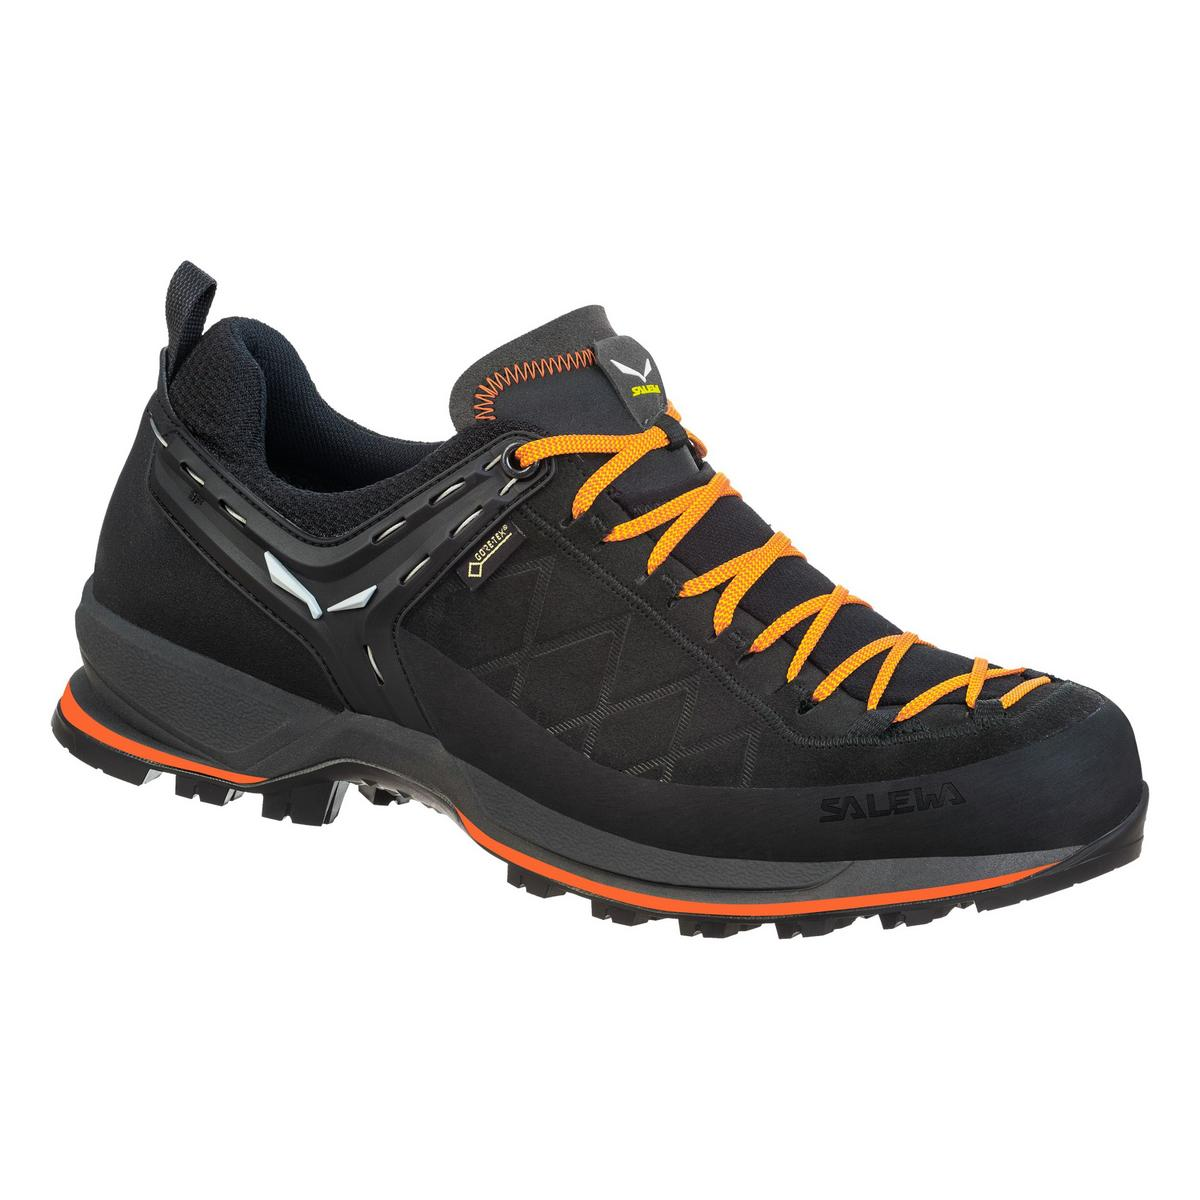 Salewa Men's Mountain Trainer Gore-Tex Approach Shoe